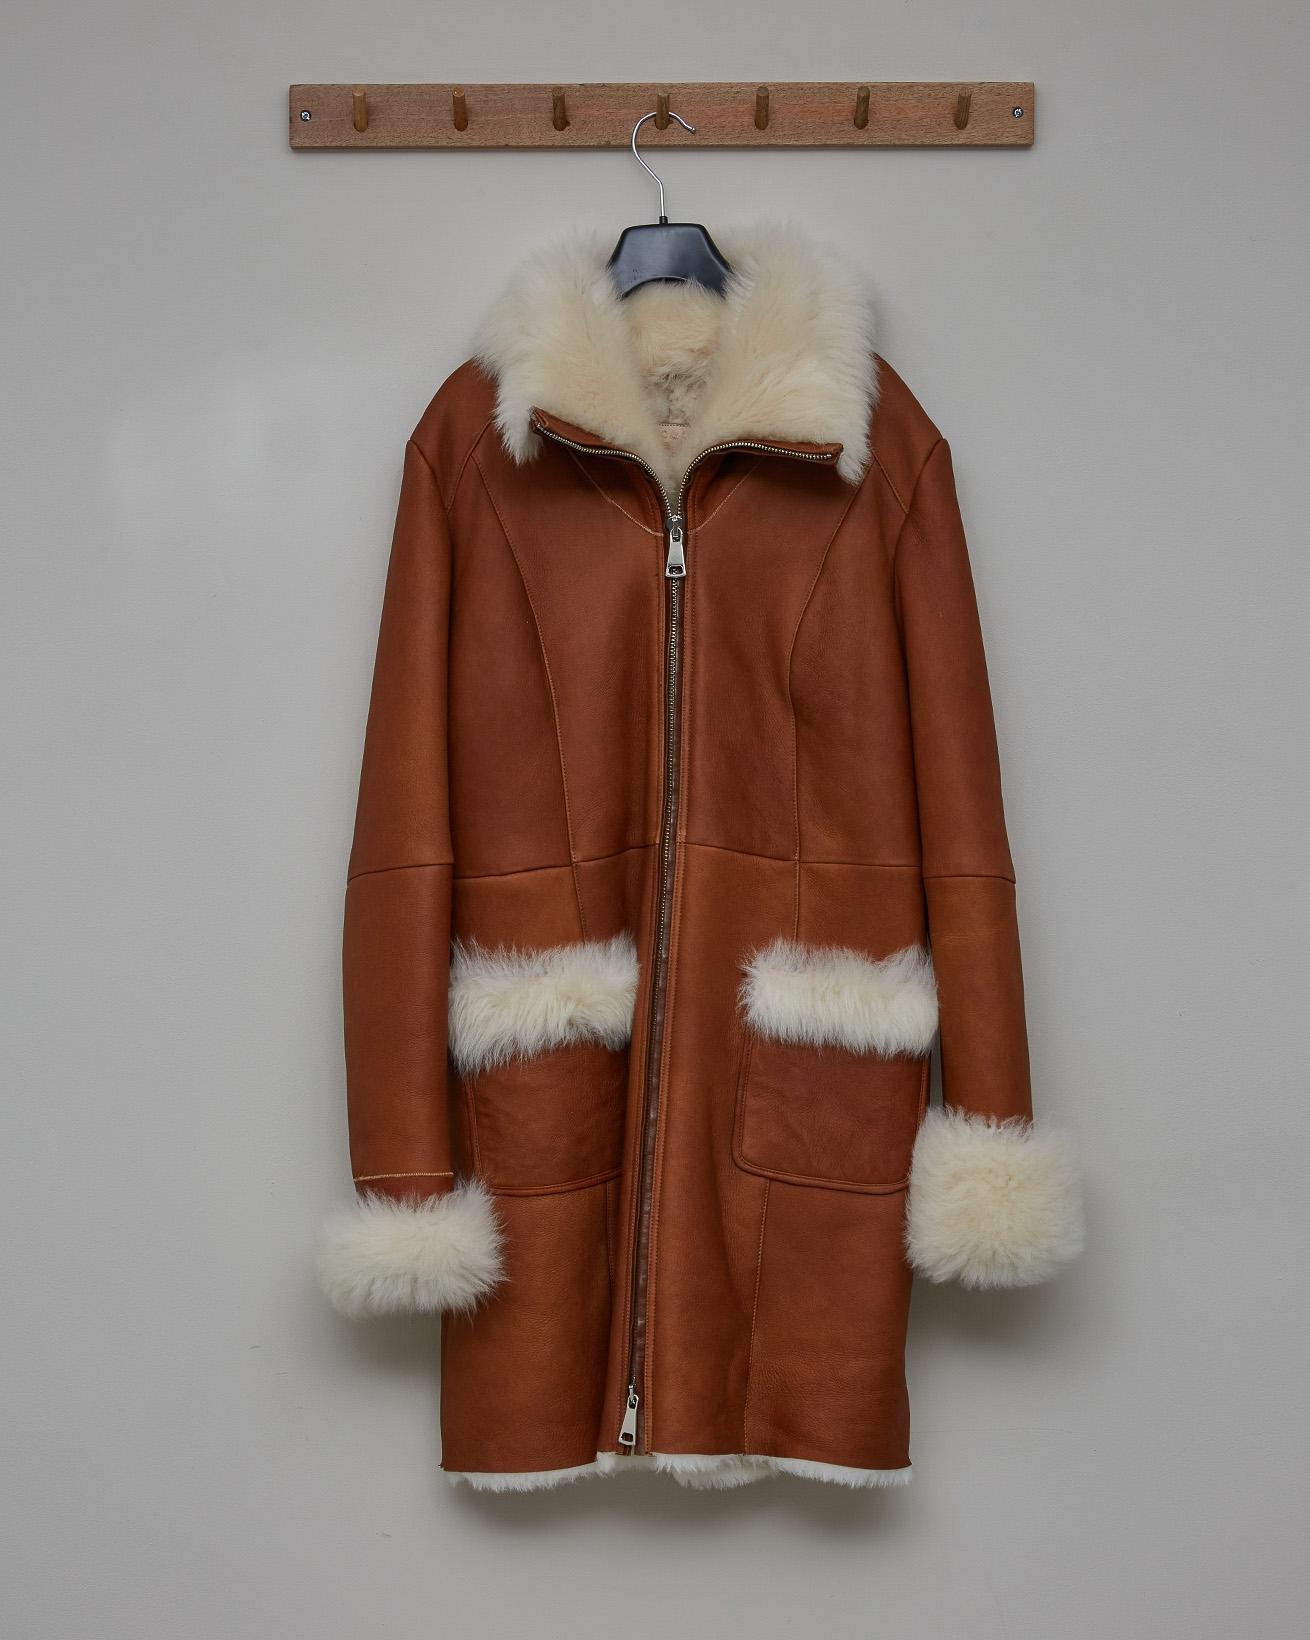 Toscana Trim Zip Up Coat - Honey - Size 10 - 2708